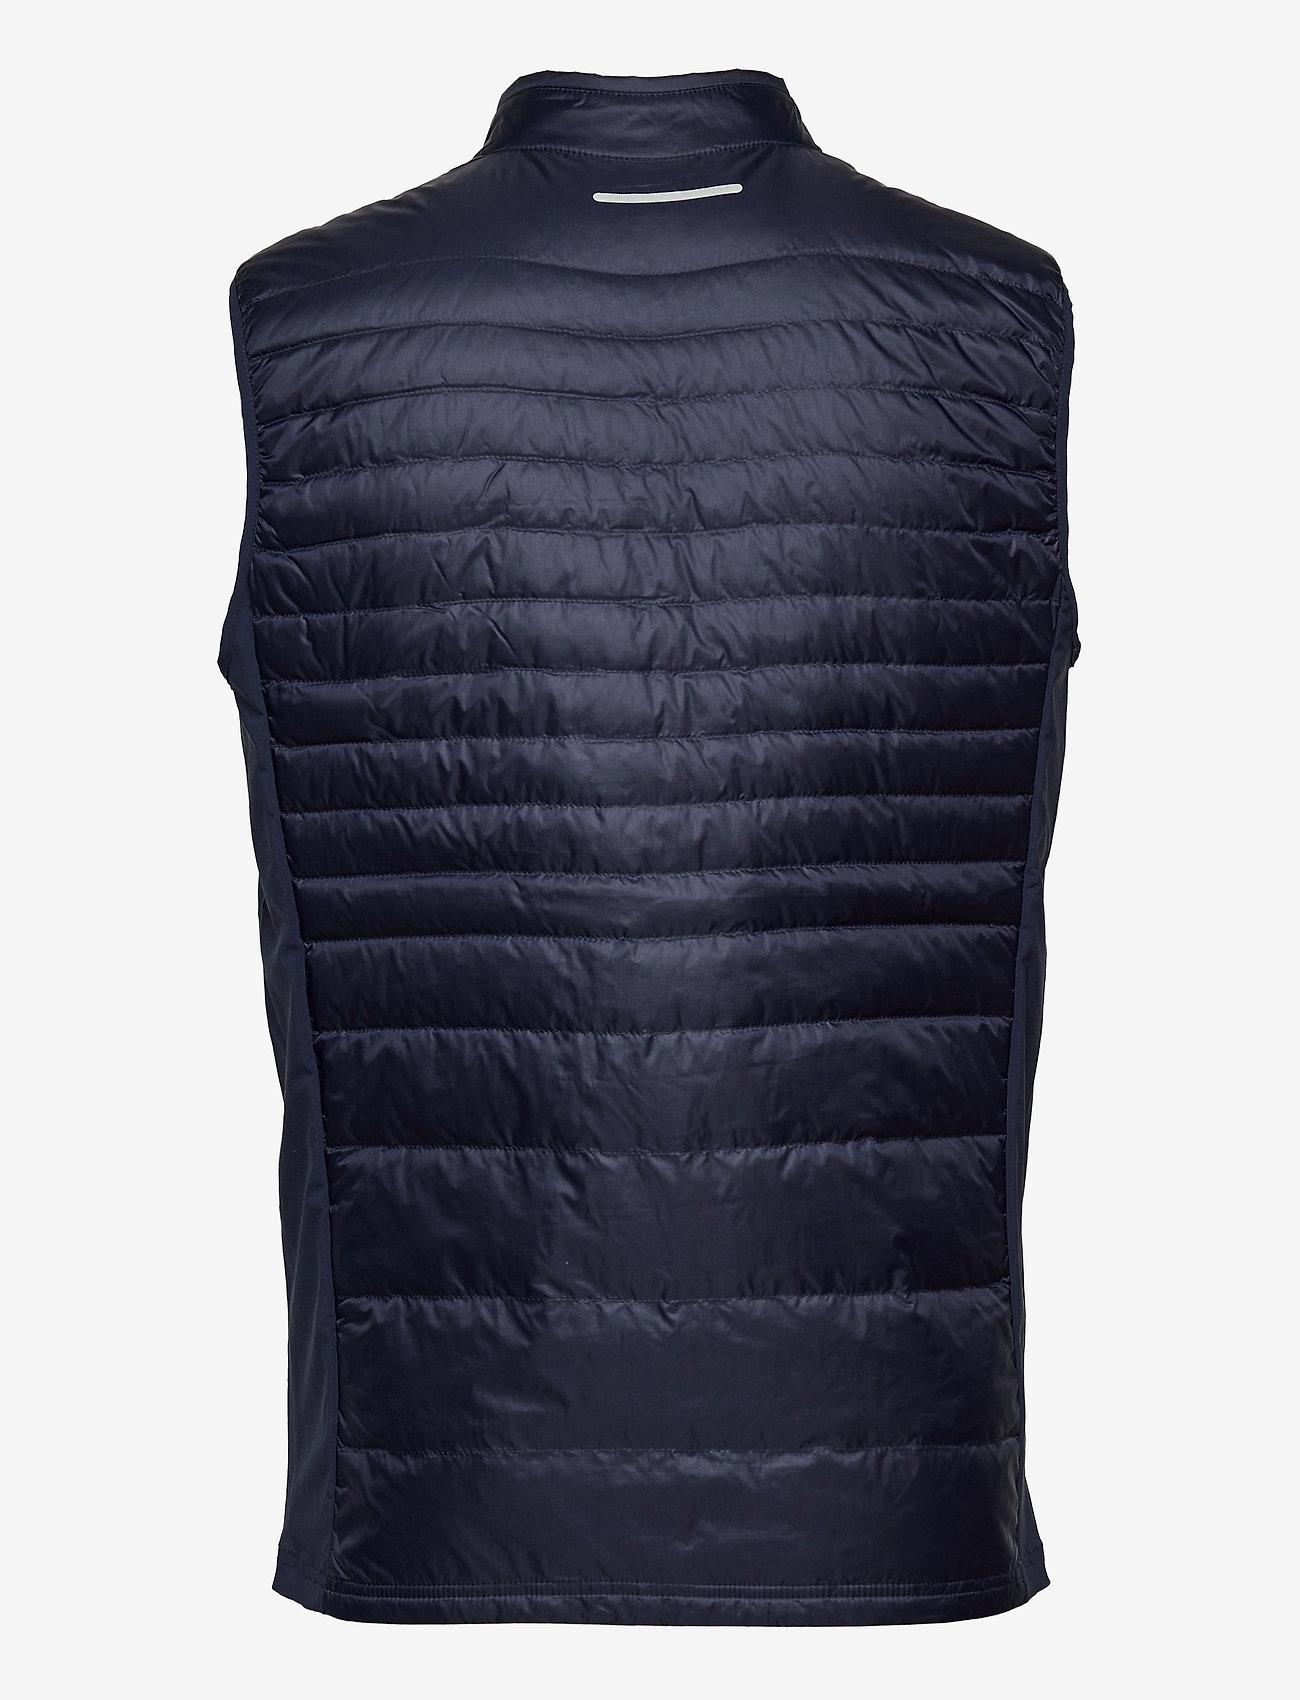 Lacoste - Men s jacket - golf jackets - navy blue/navy blue-navy blue - 1